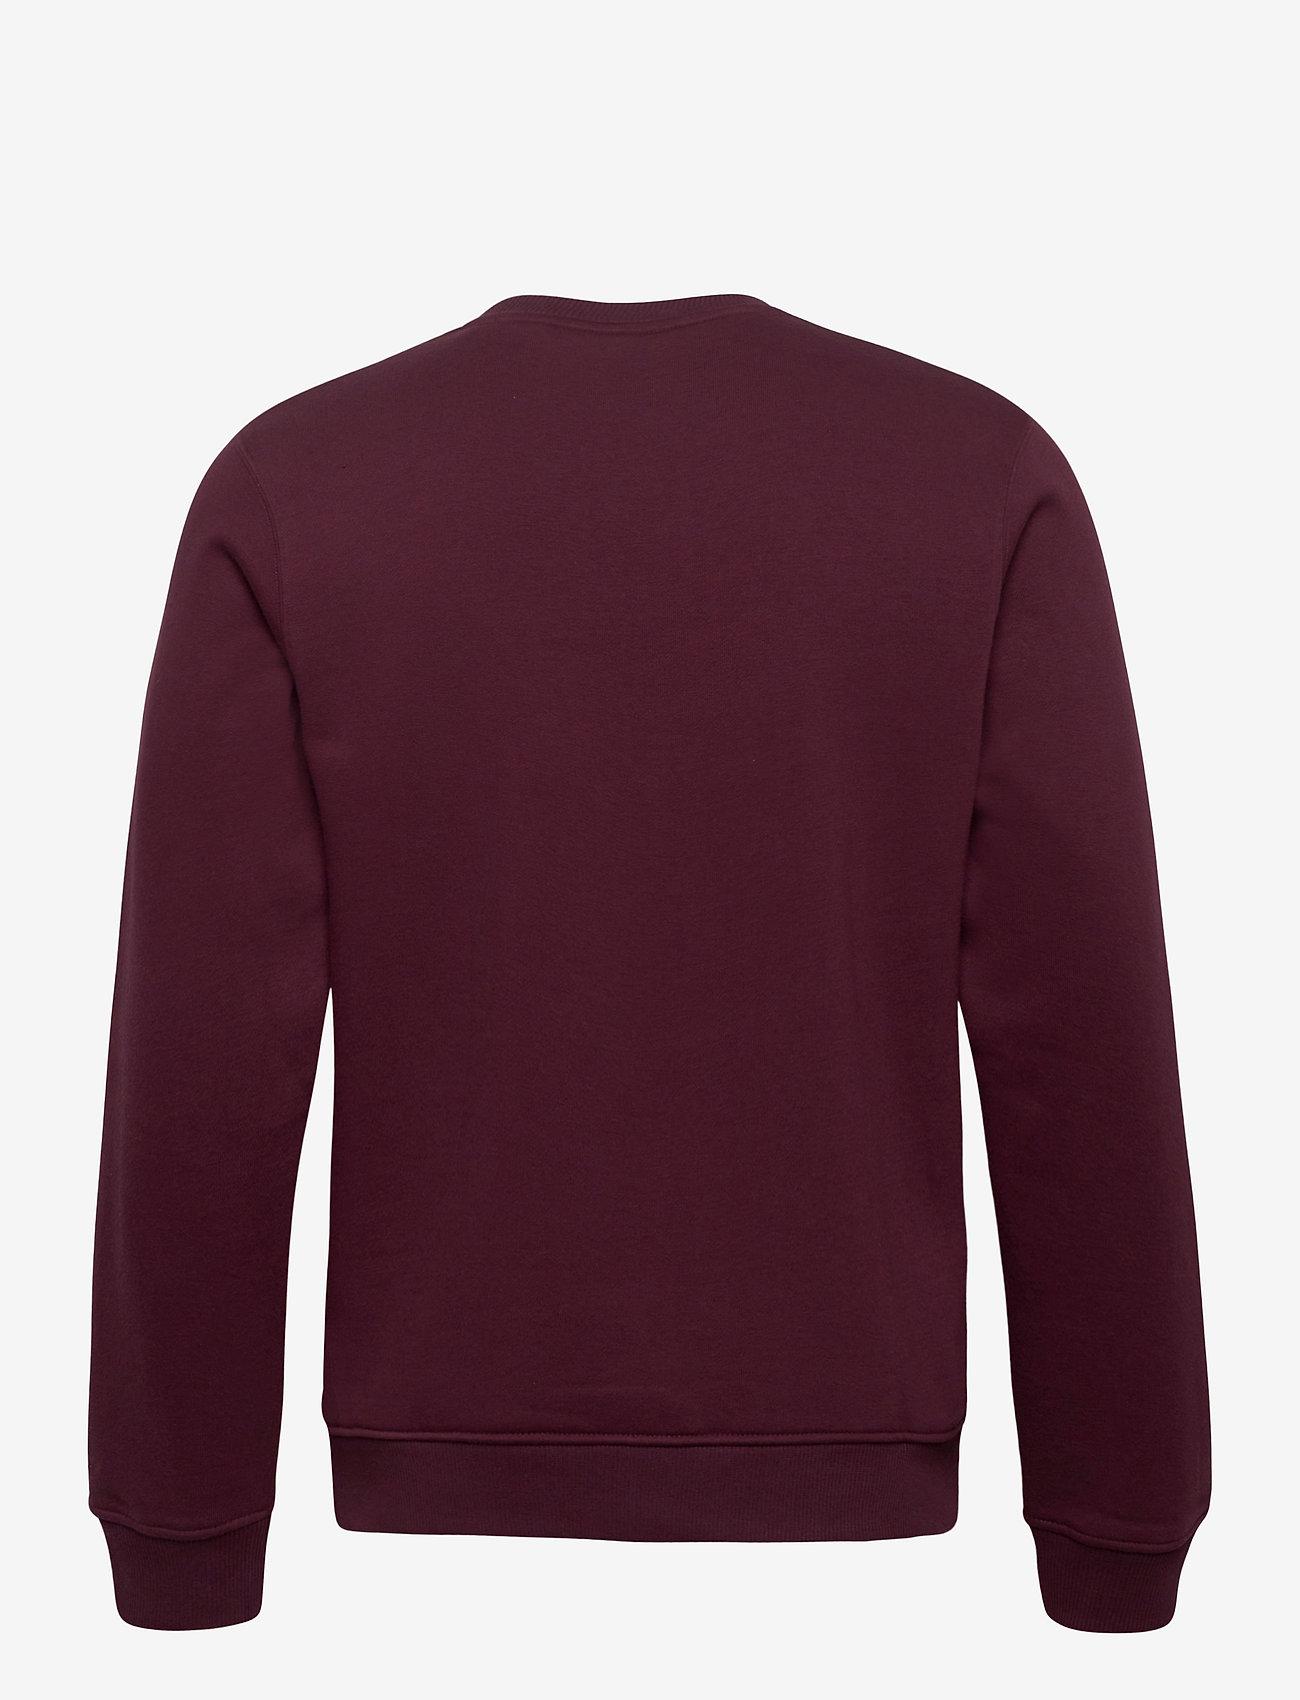 Dickies NEW JERSEY - Sweatshirts MAROON - Menn Klær